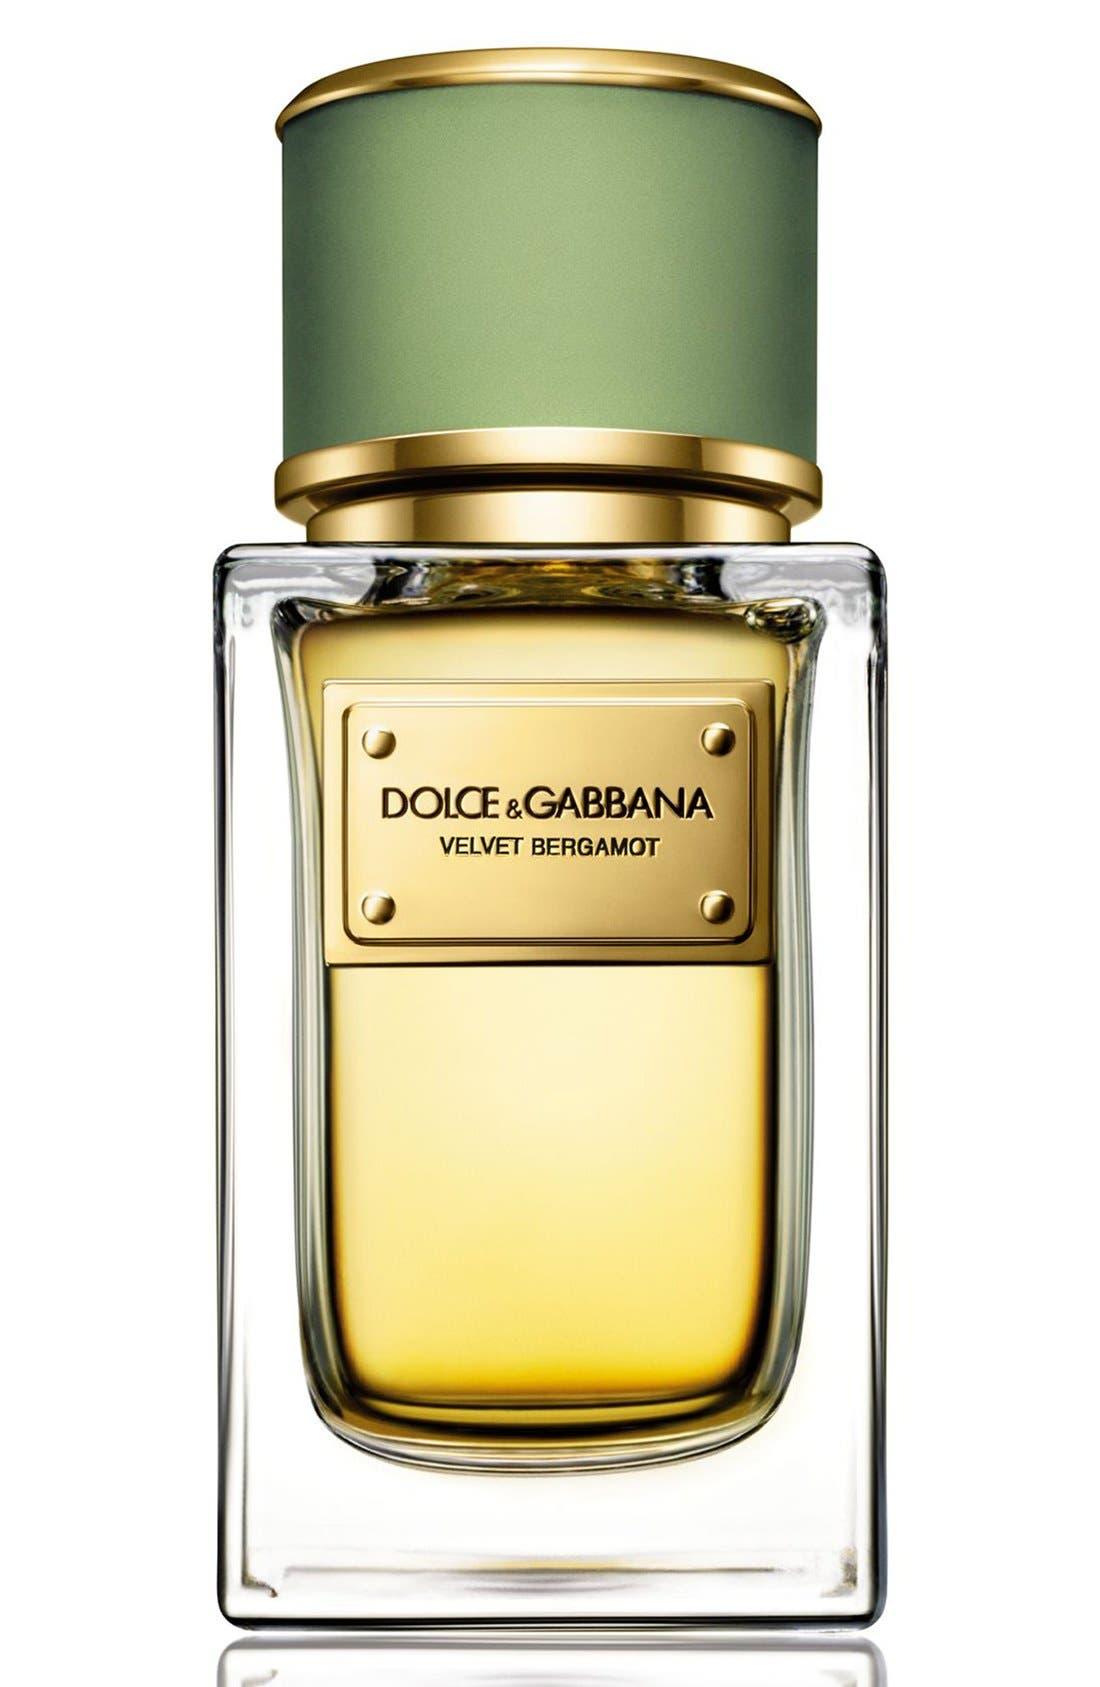 Dolce&Gabbana Beauty Velvet Bergamot Eau de Parfum